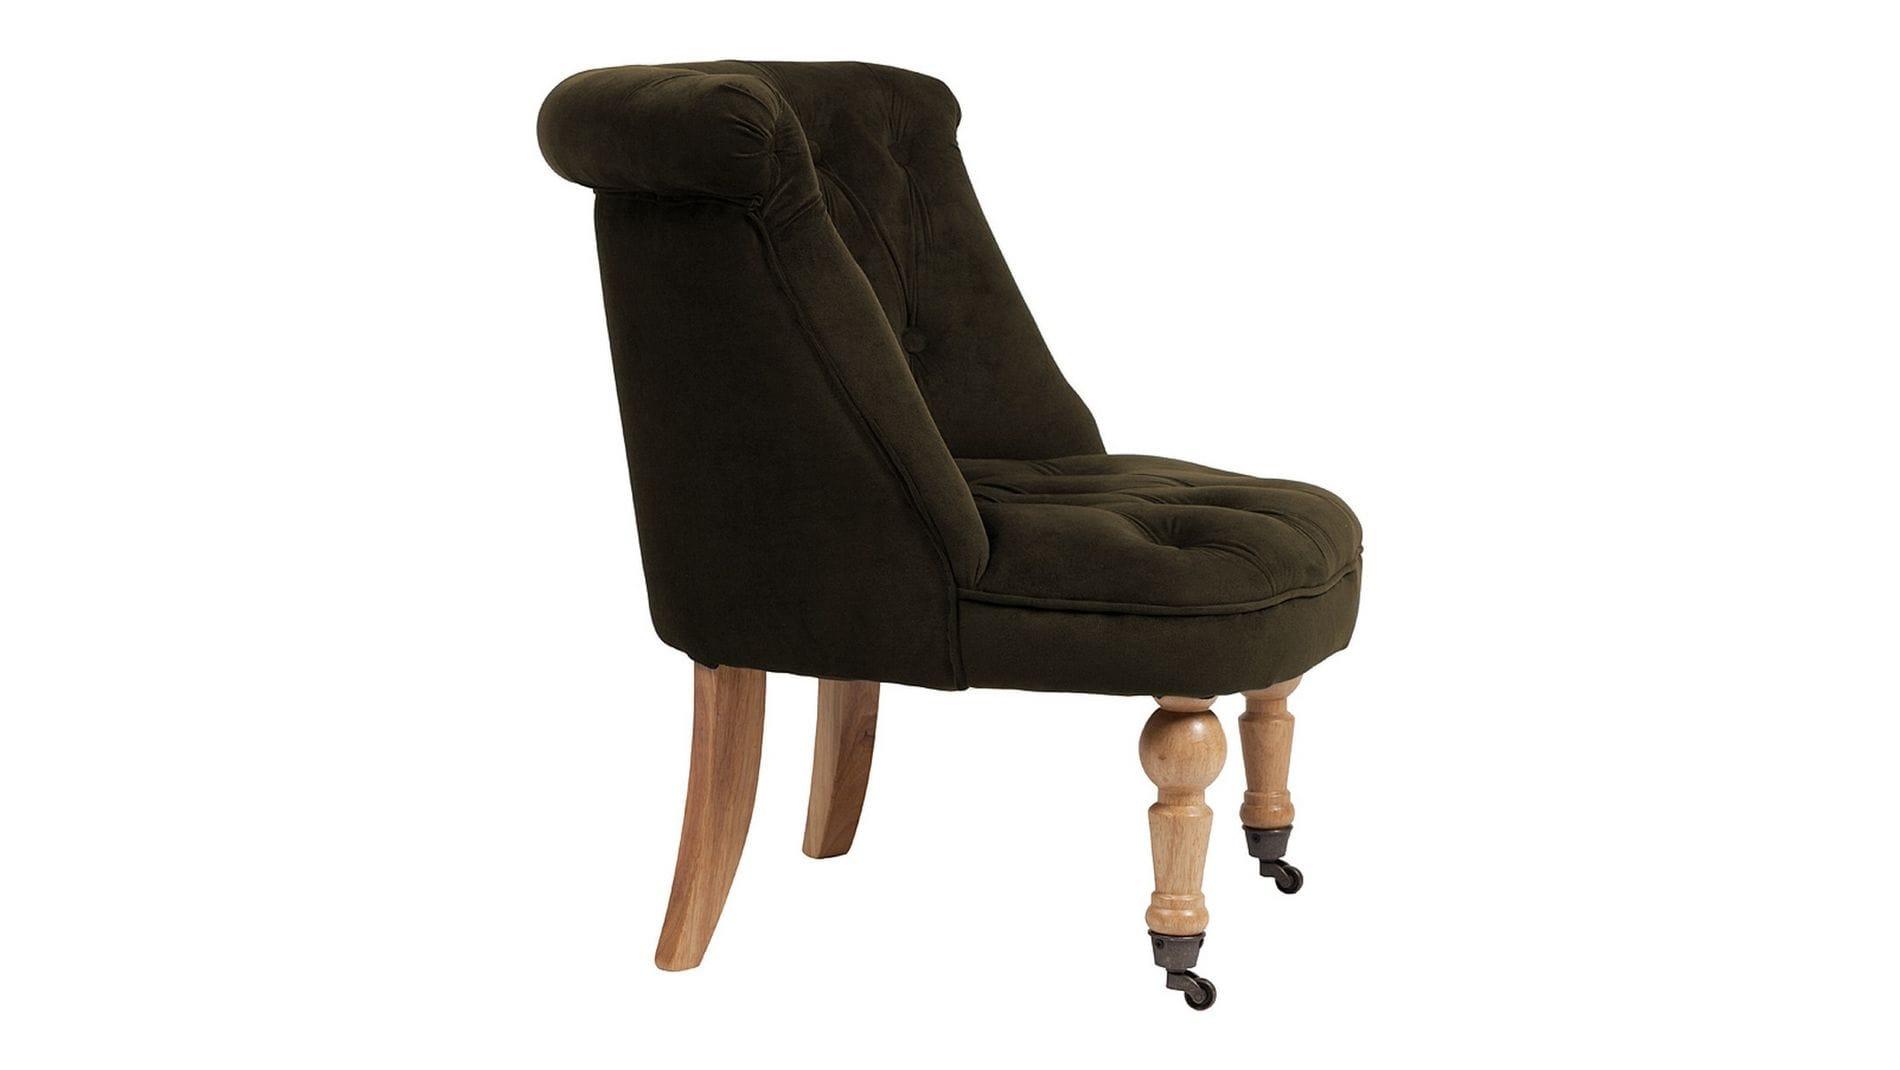 Кресло Amelie French Country Chair Серо-Коричневый Велюр М